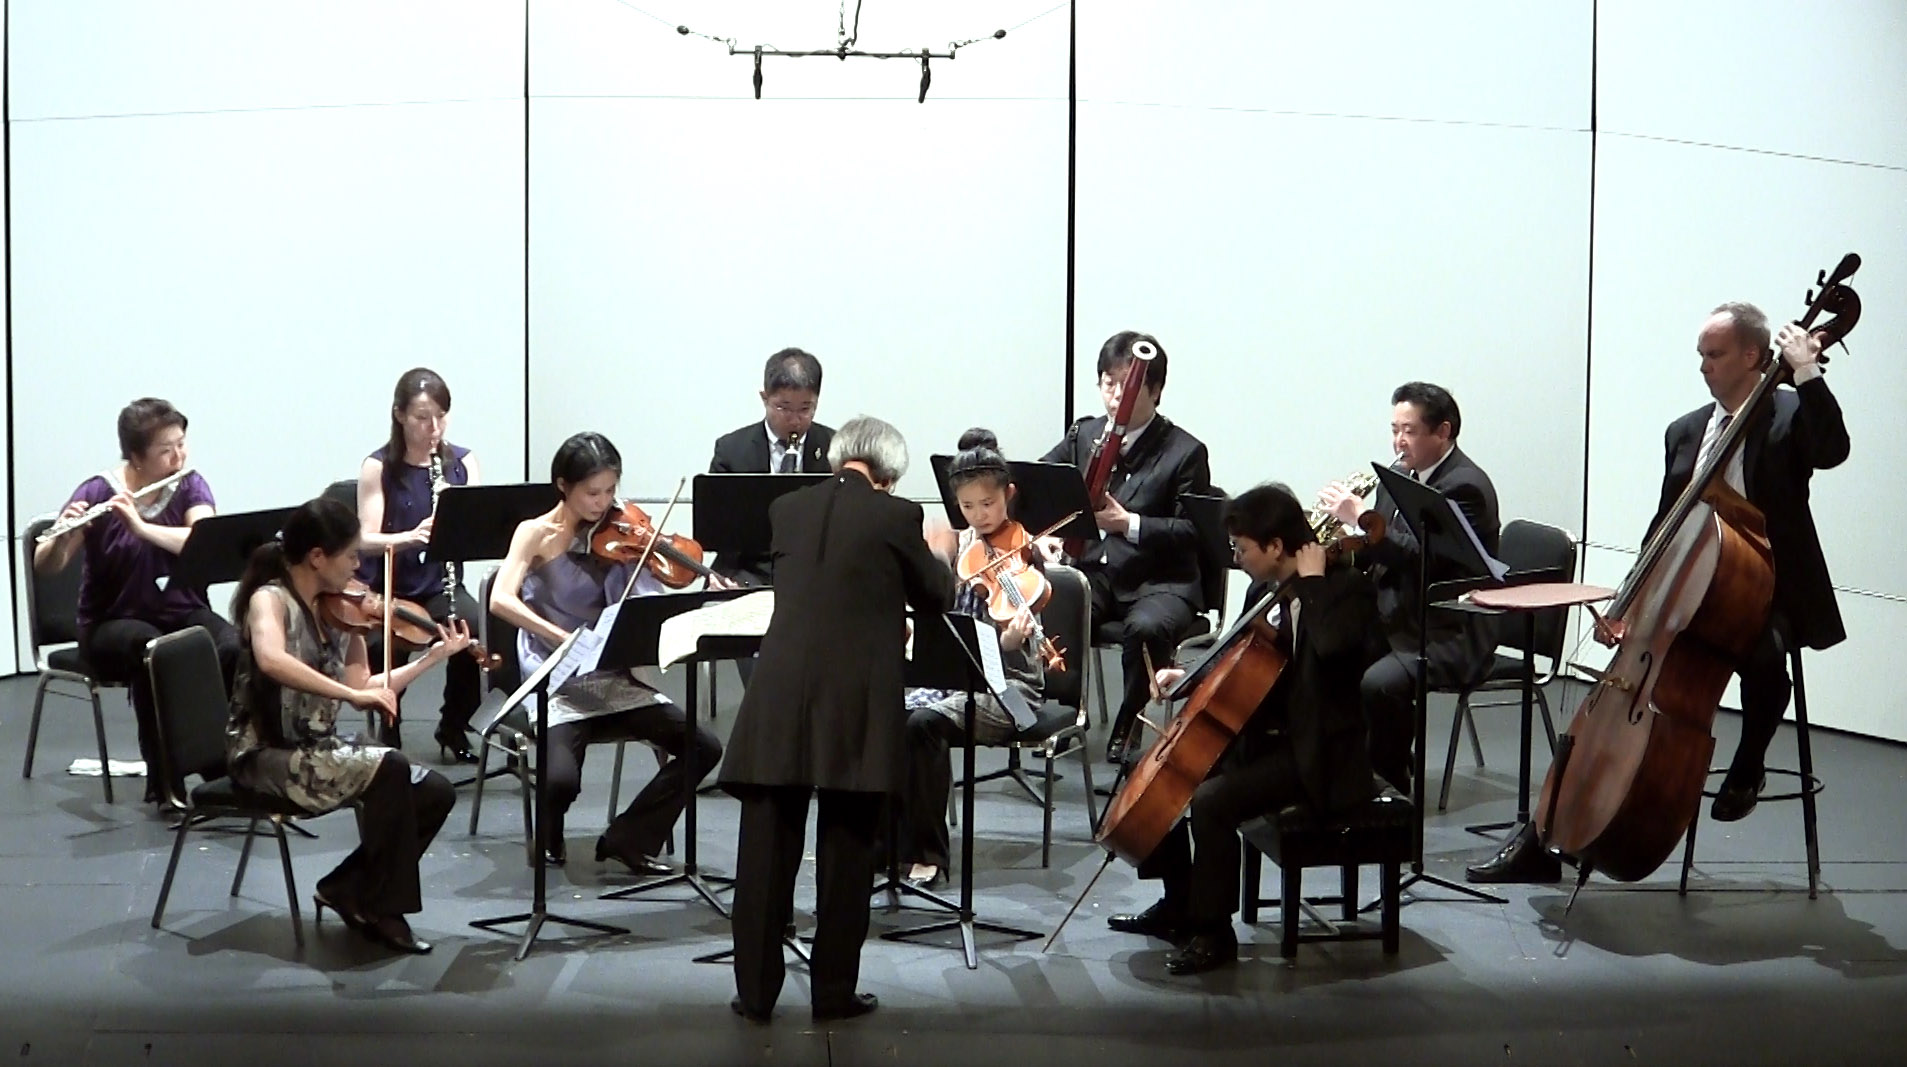 20150603 - ISCM Musicarama 2015 Ensemble Kochi2